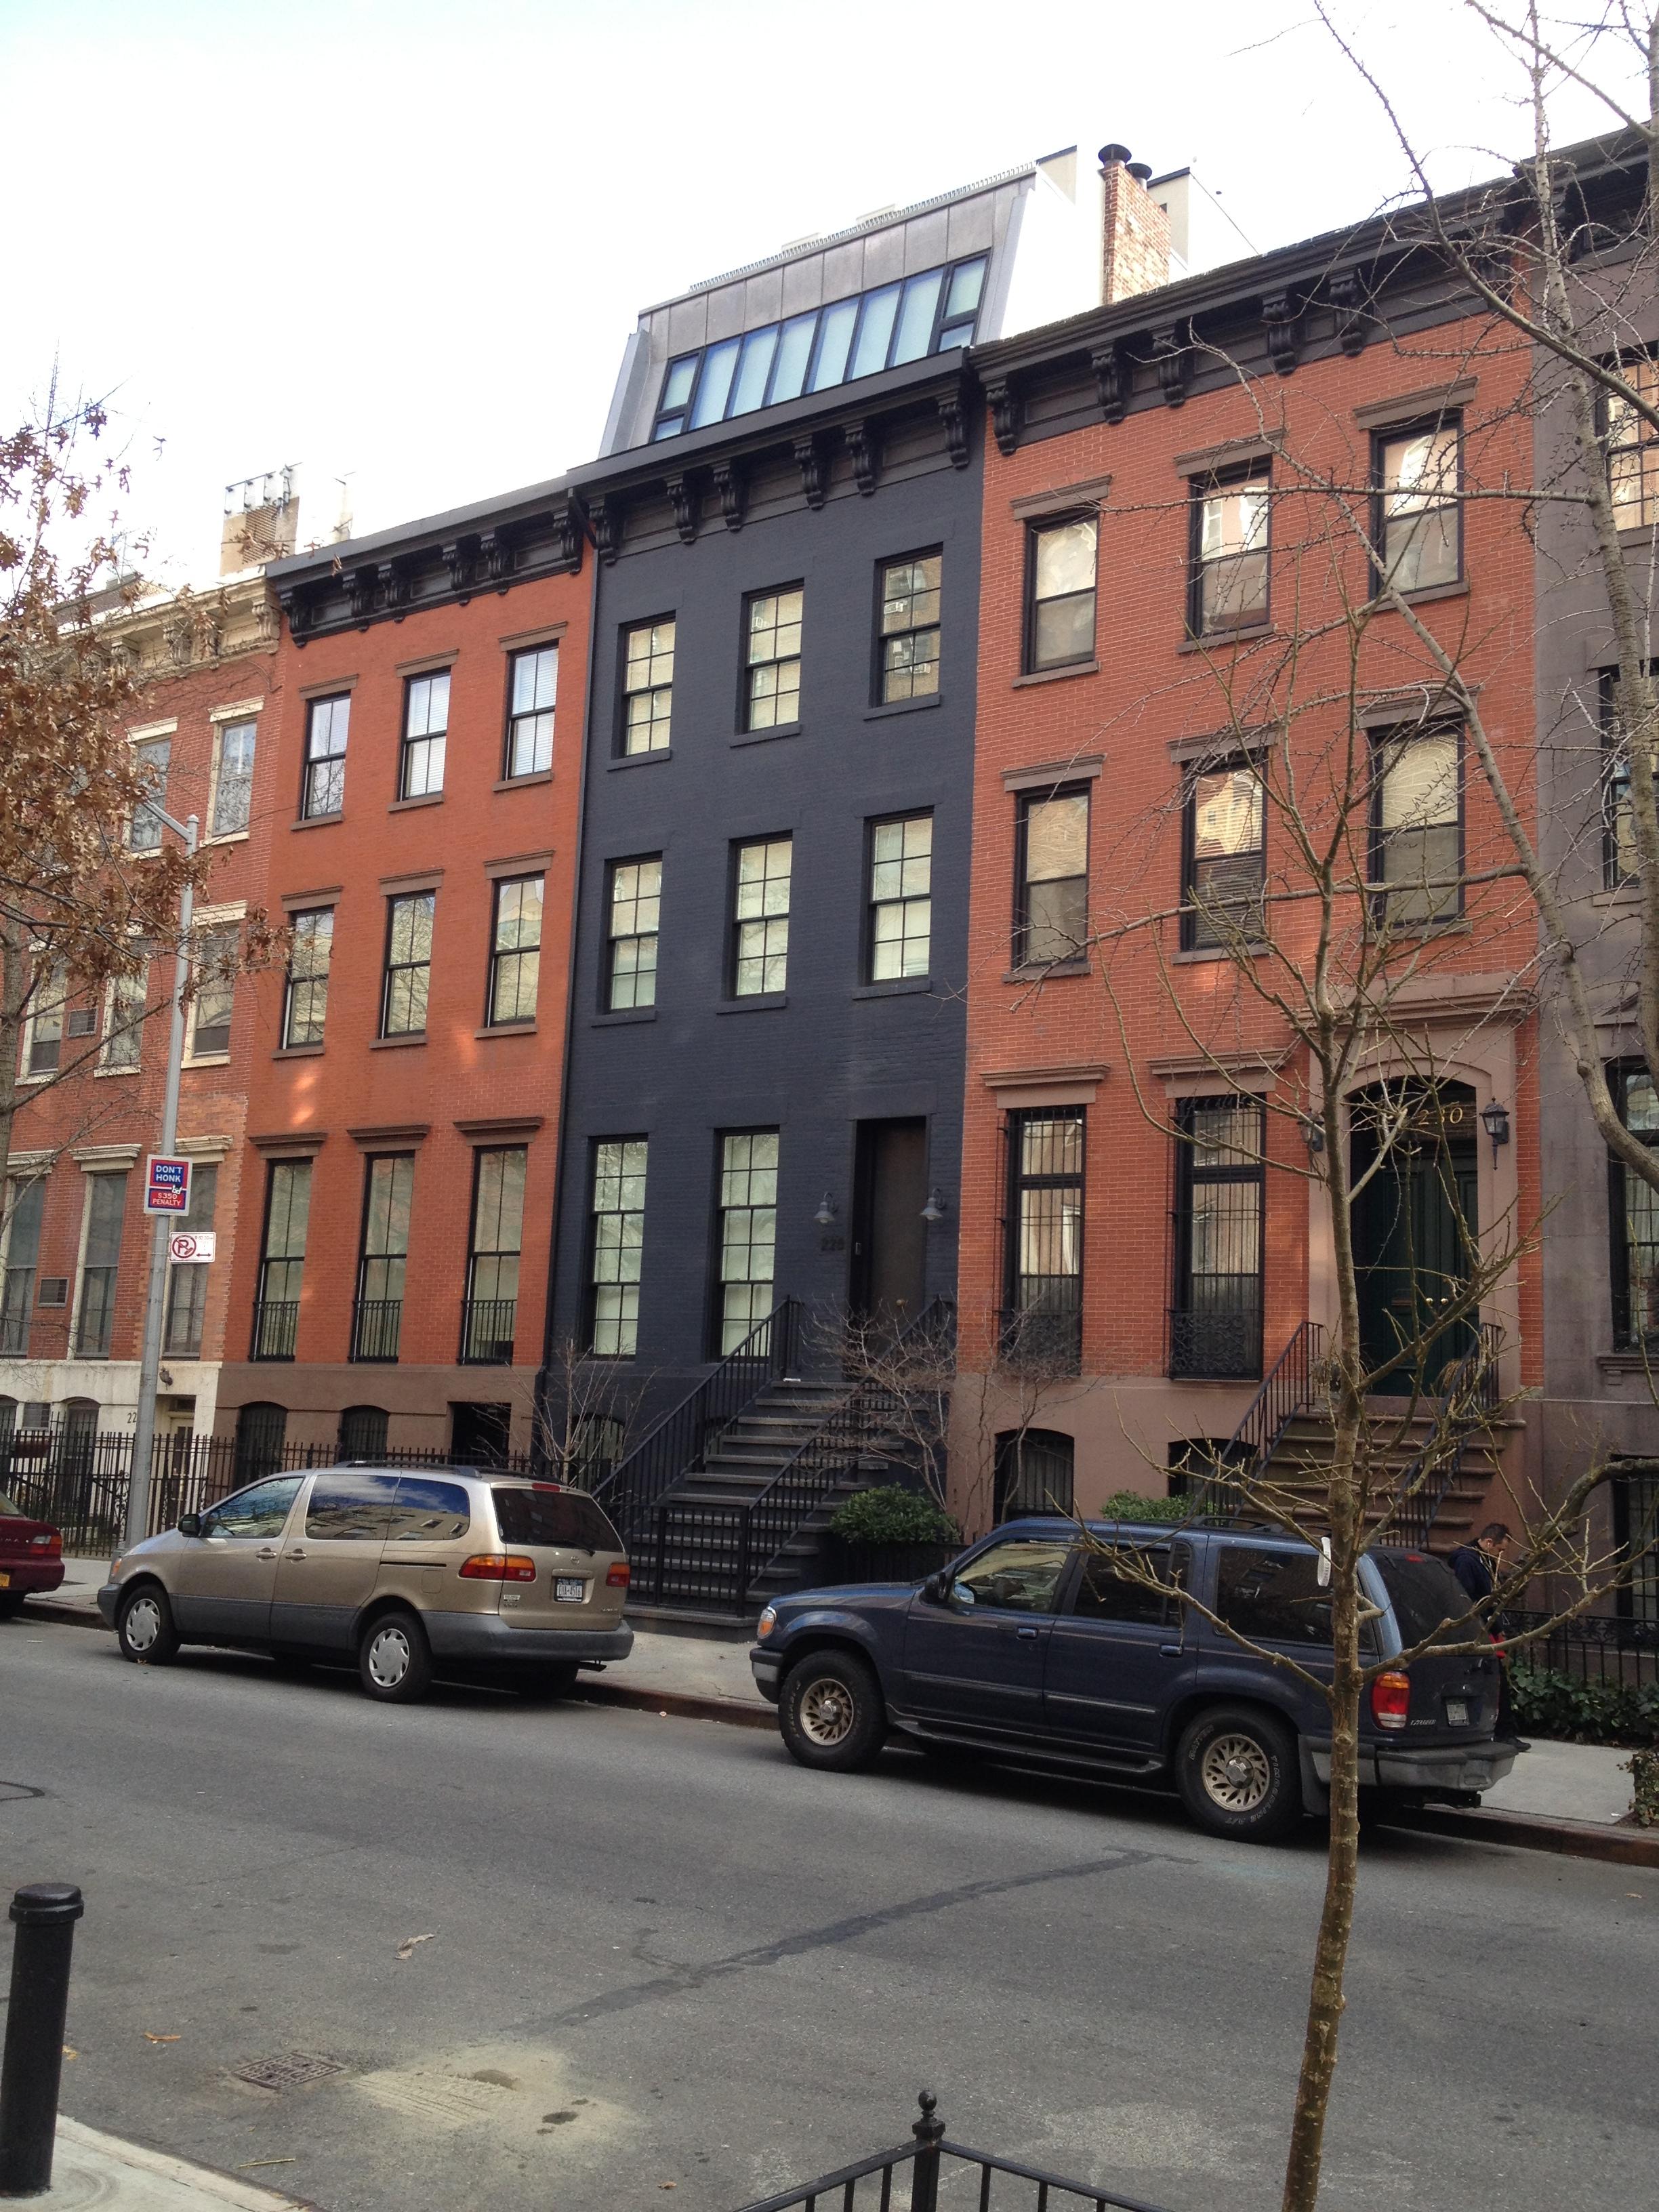 West 22nd street - New York, NY